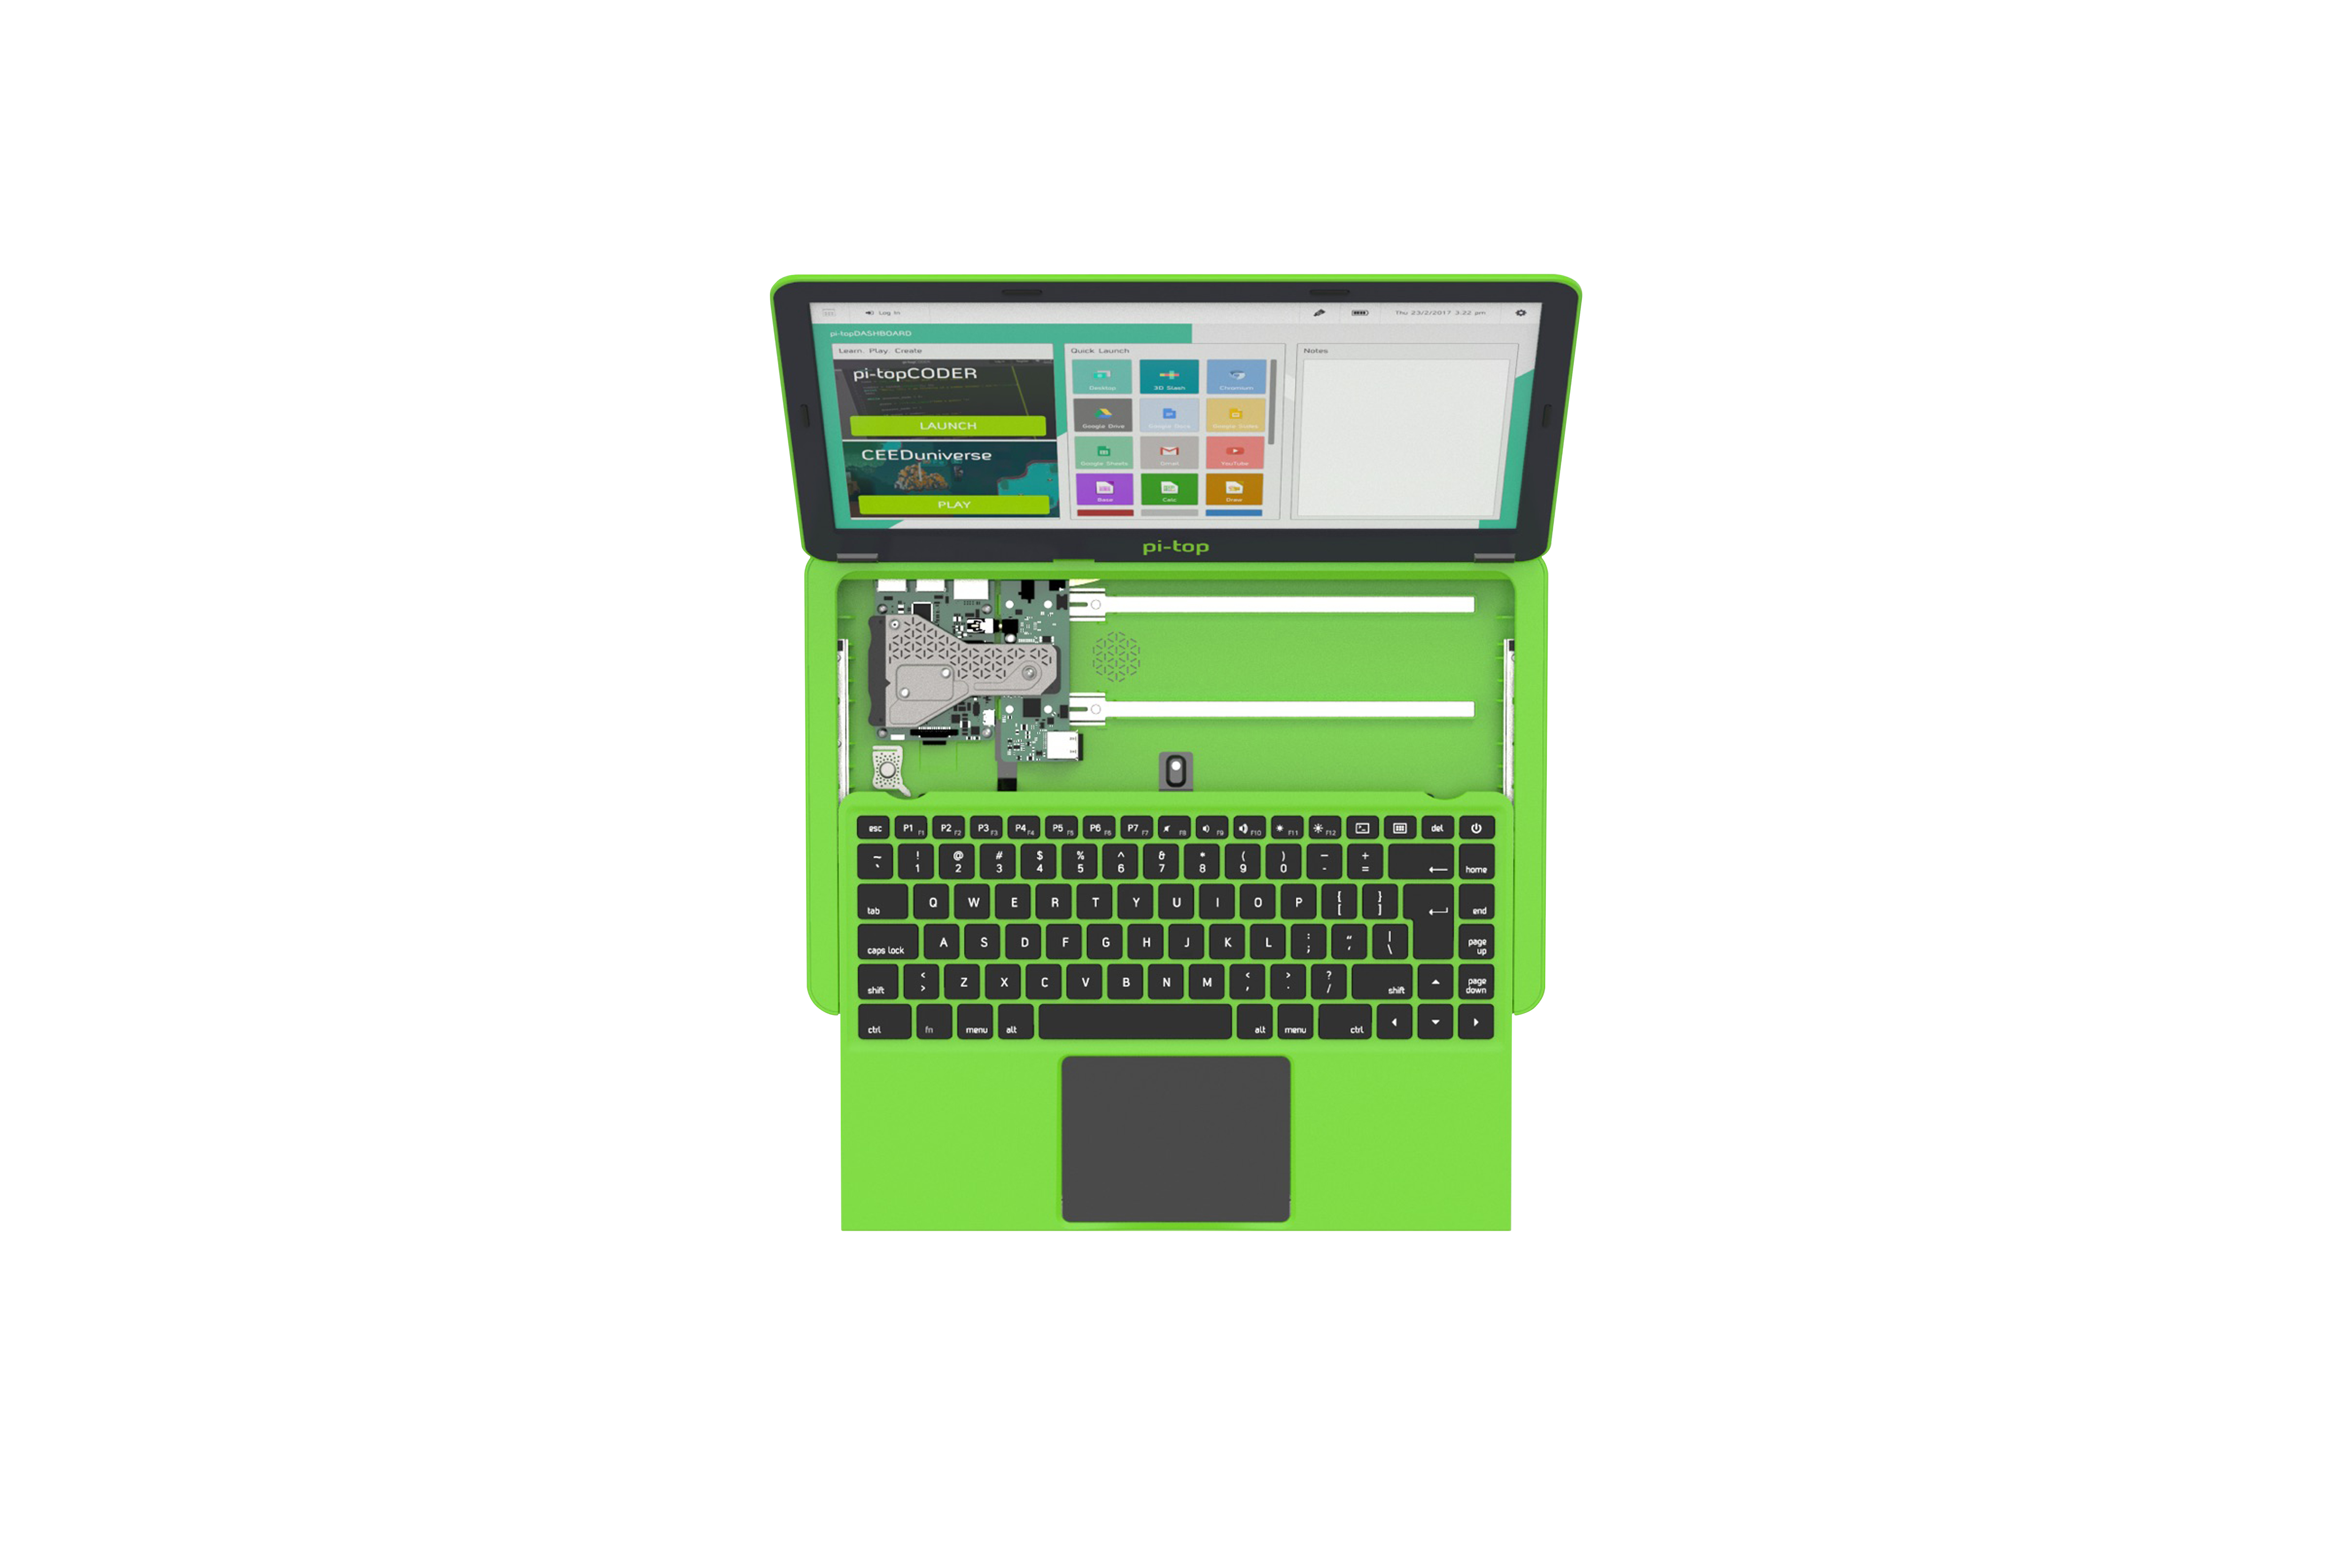 Pi-Top Raspberry Pi Laptop - Uk Keyboard - Green